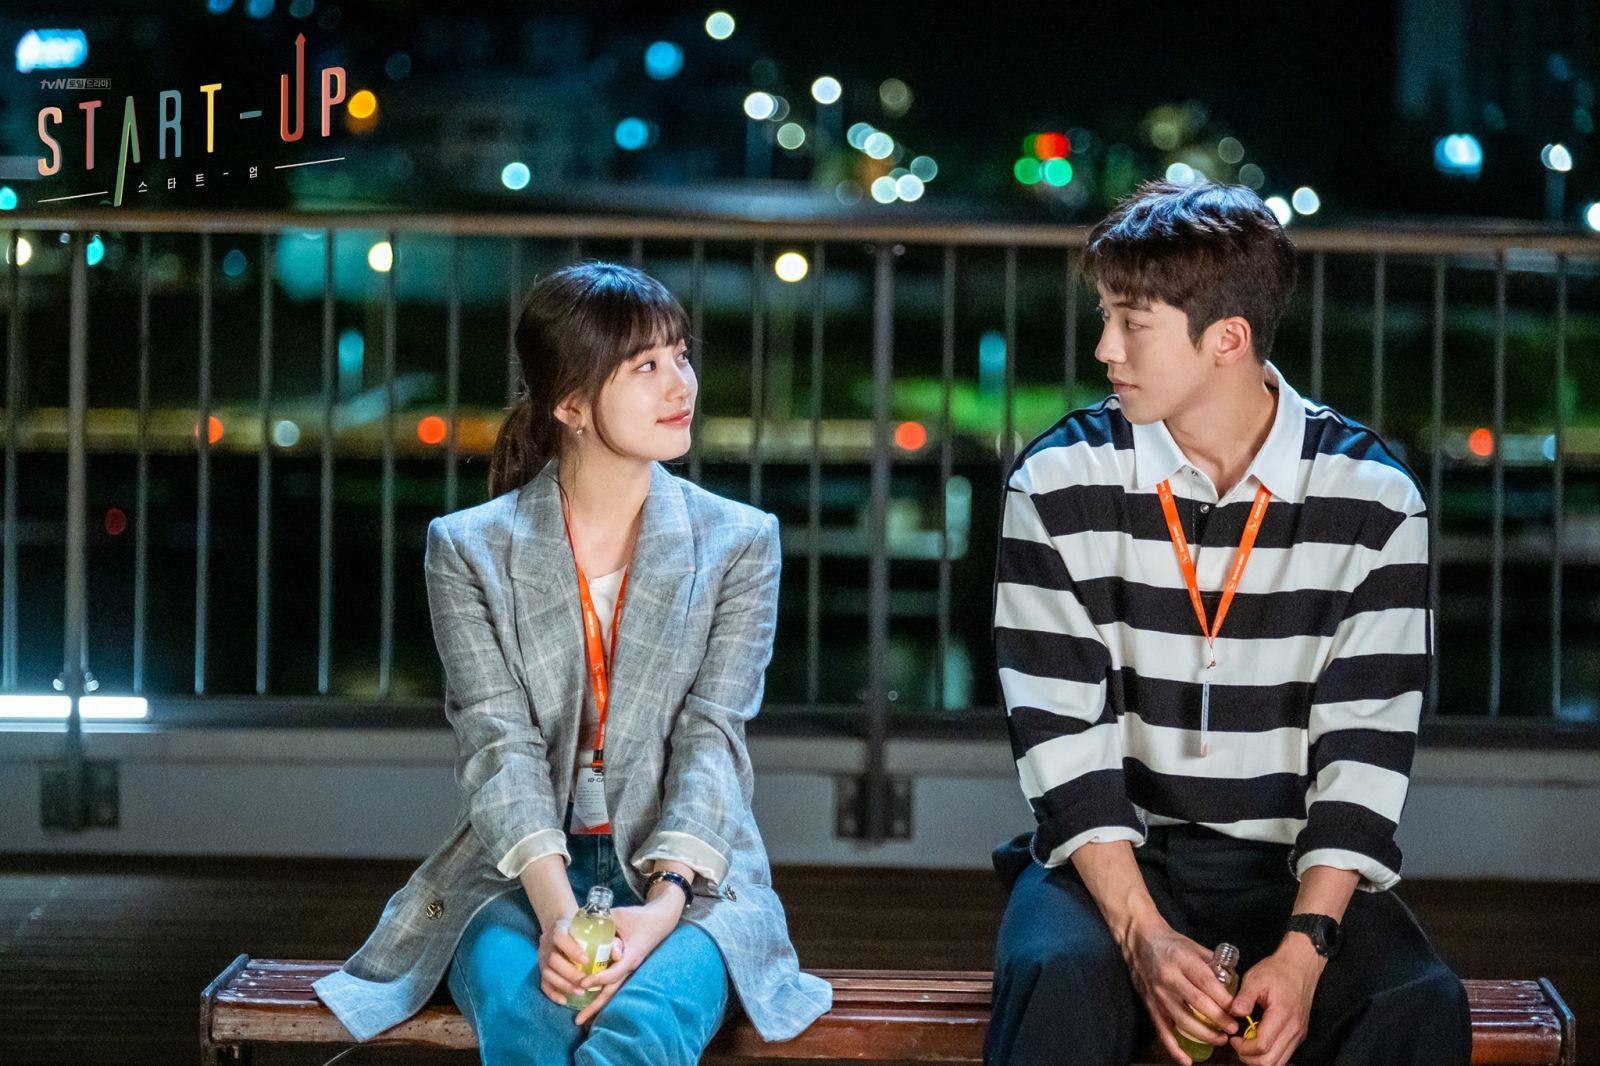 suzy-nam-joo-hyuk-start-up-photo-2